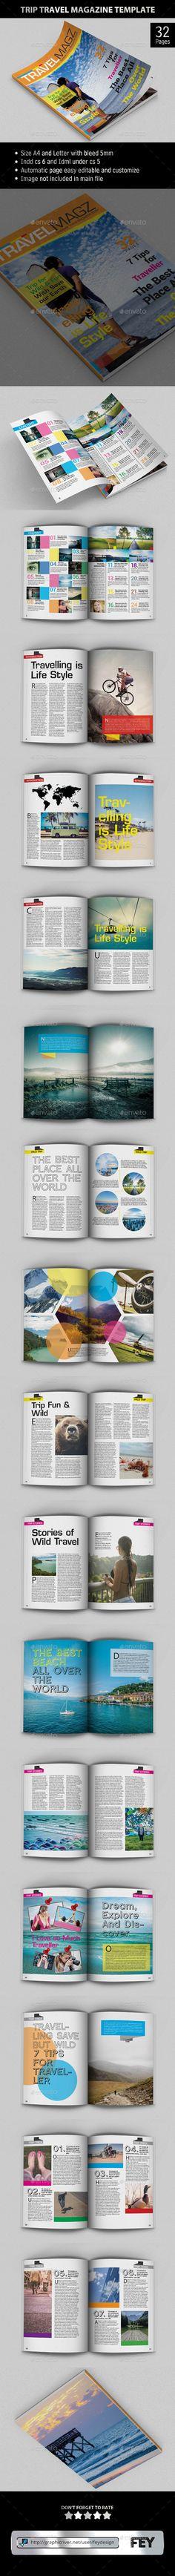 Trip Travel - Magazine Template   Download: http://graphicriver.net/item/trip-travel-magazine-template/9717069?ref=ksioks